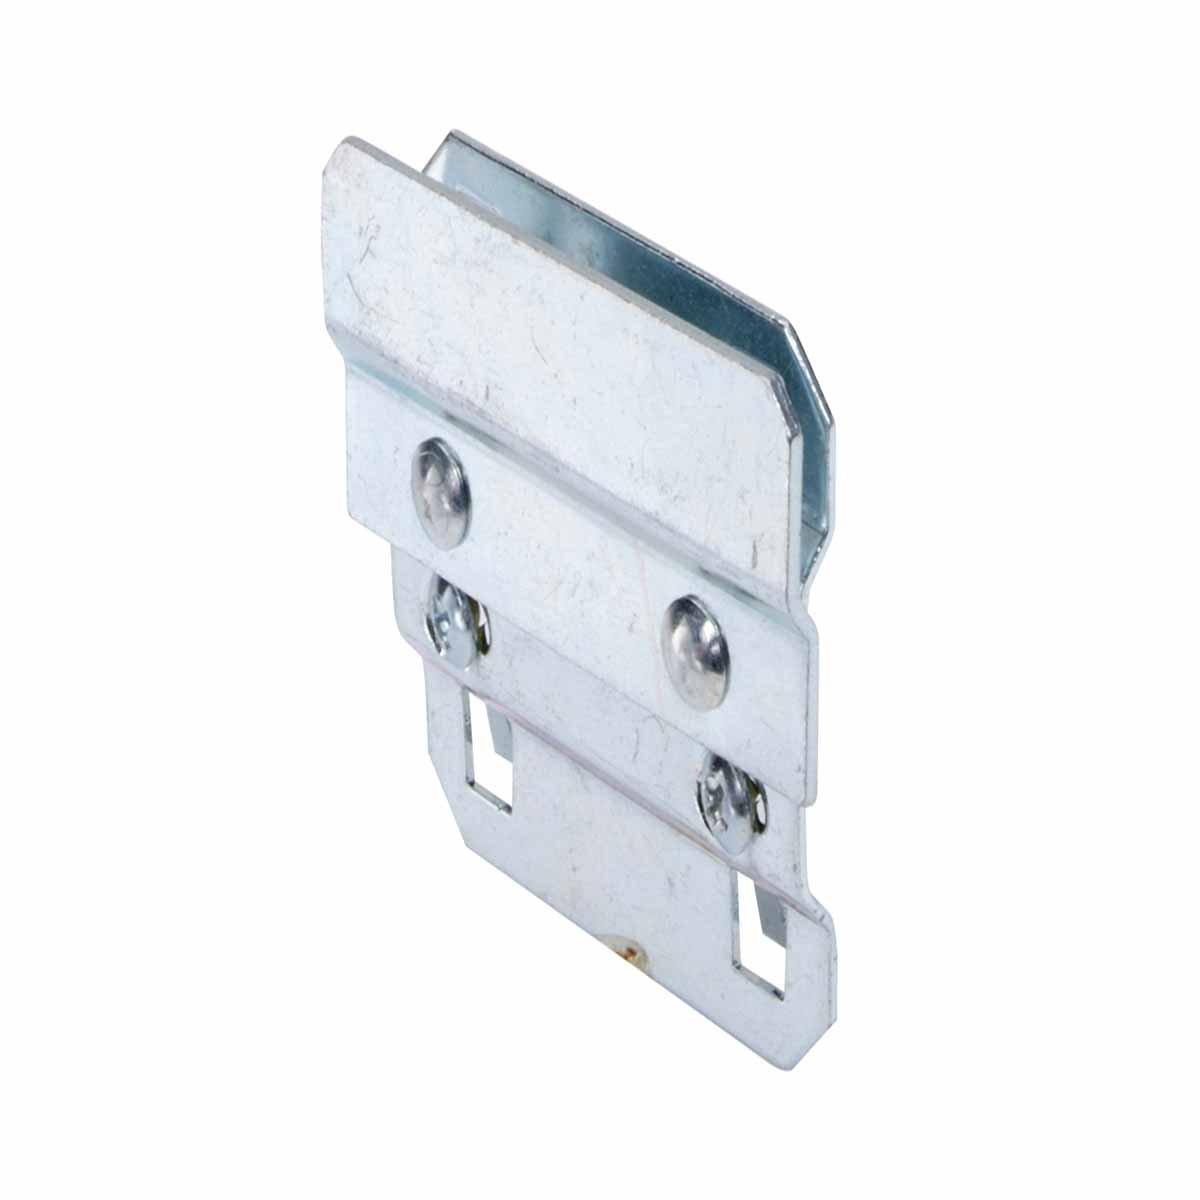 Triton Products 57500 LocHook Zinc Plated Steel Binclip for LocBoard, 5-Pack